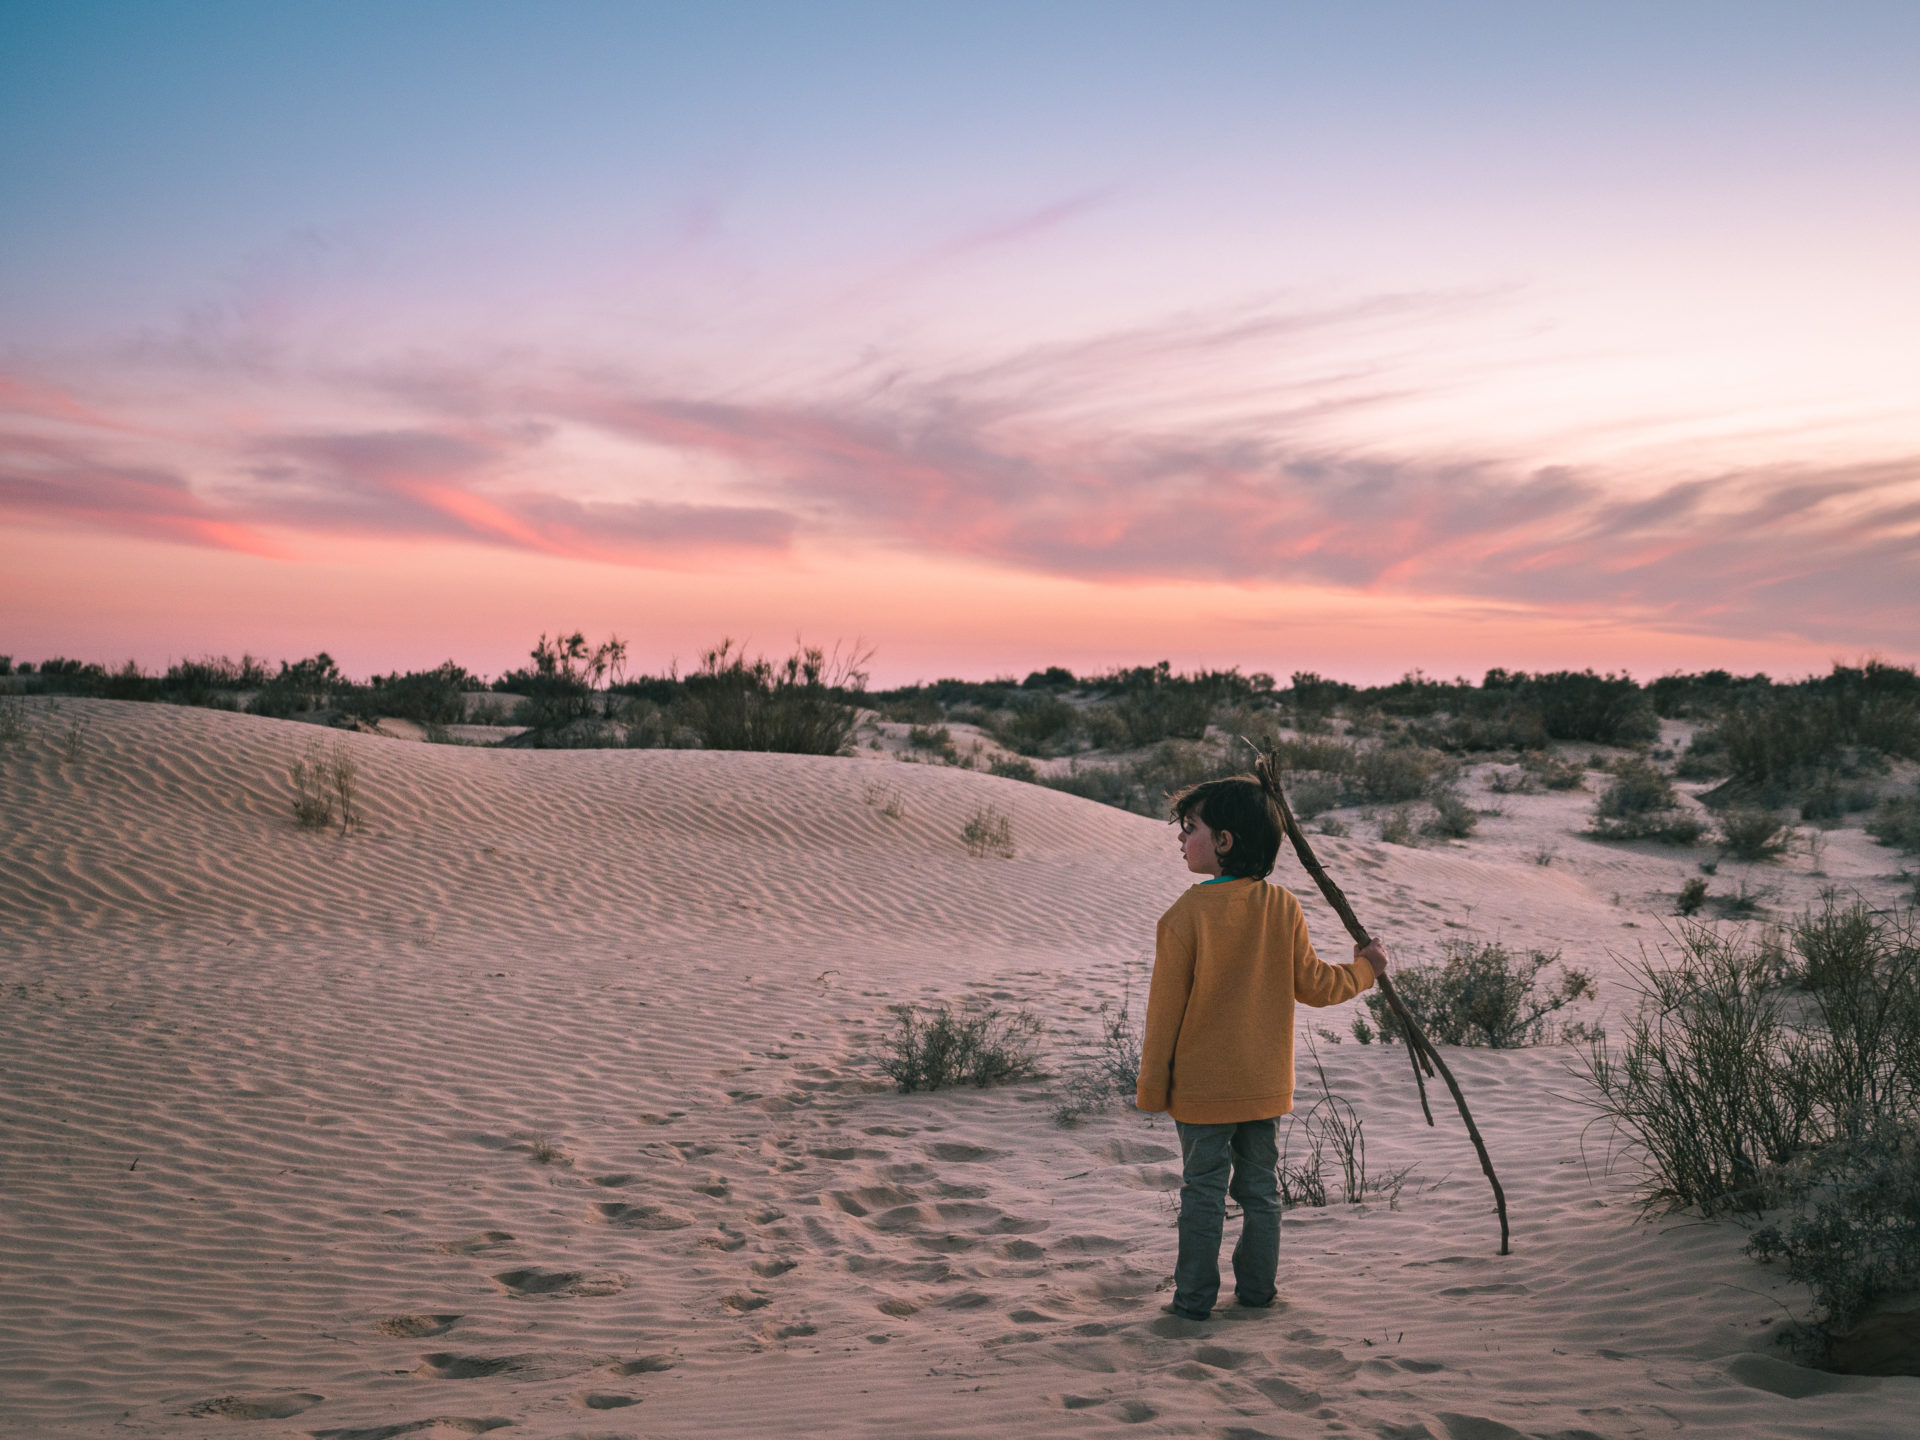 désert tunisie enfant